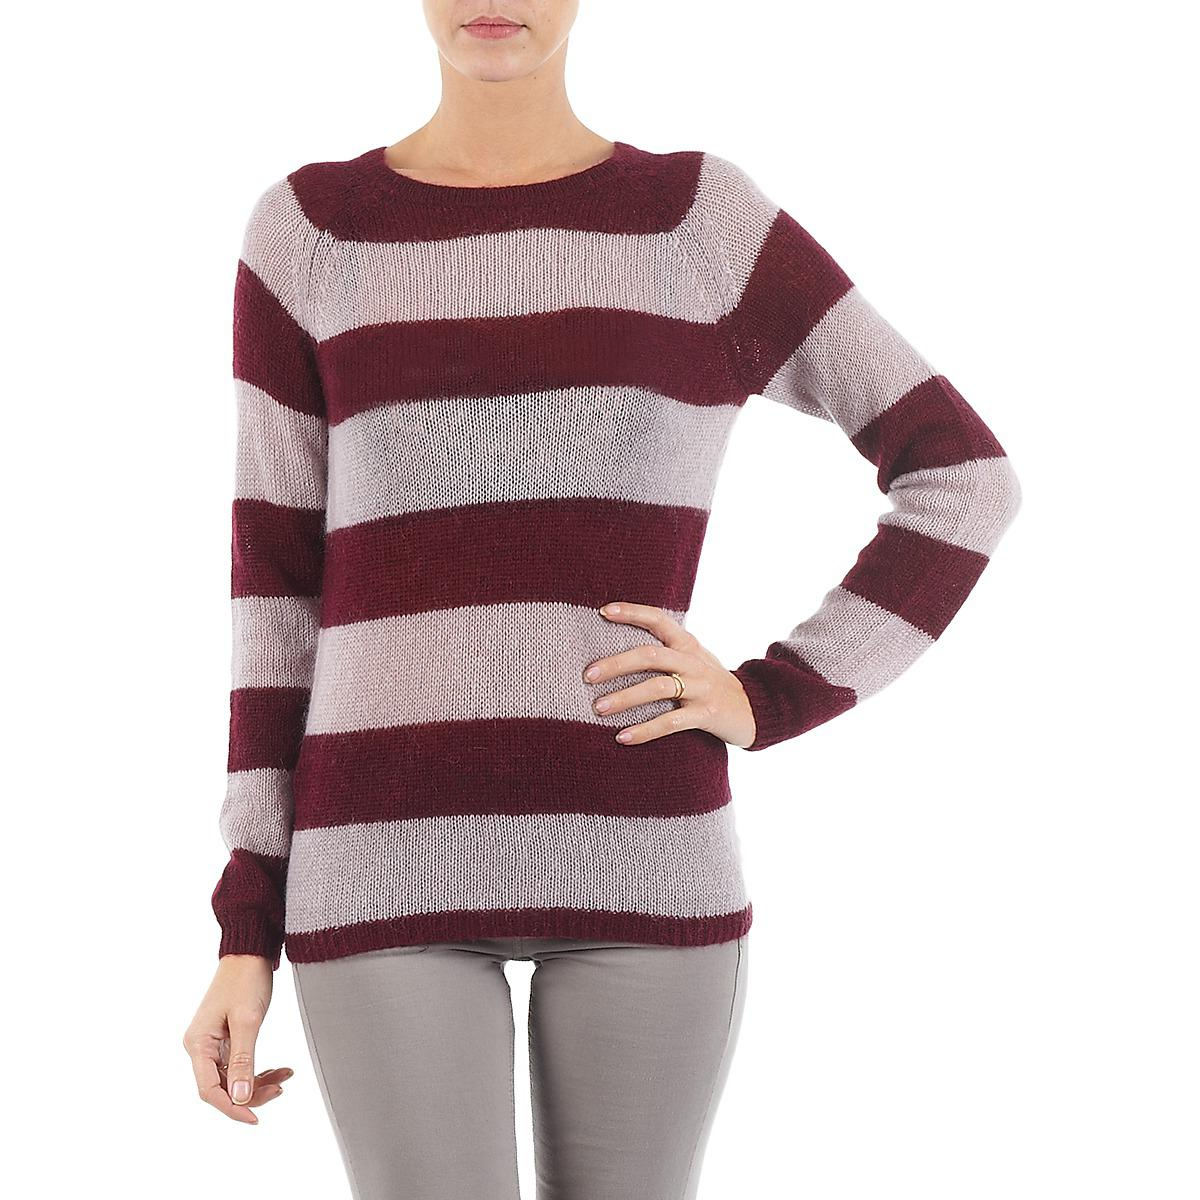 b6fda7b802 Gant C. Mohair Blockstripe Crewneck Women s Sweater In Red in Red - Lyst